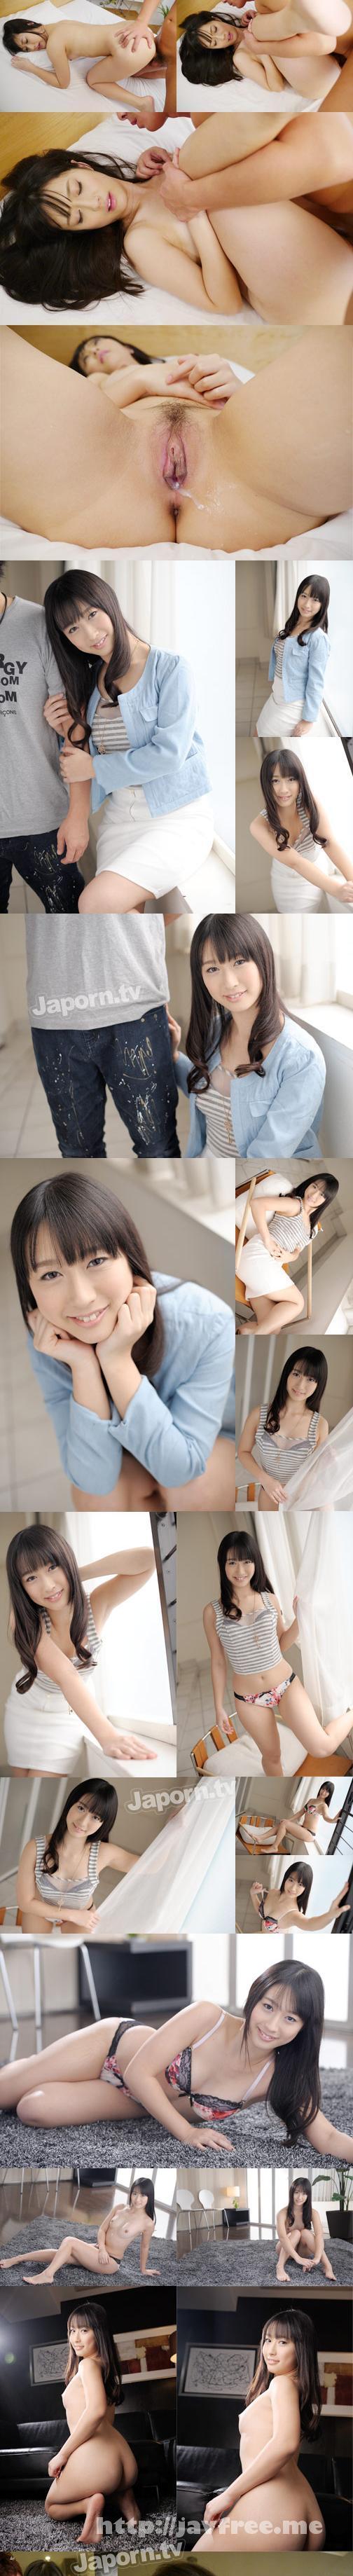 [DSAMD-05] 親友の彼女 : 本澤朋美 - image DSAMD-05_3 on https://javfree.me